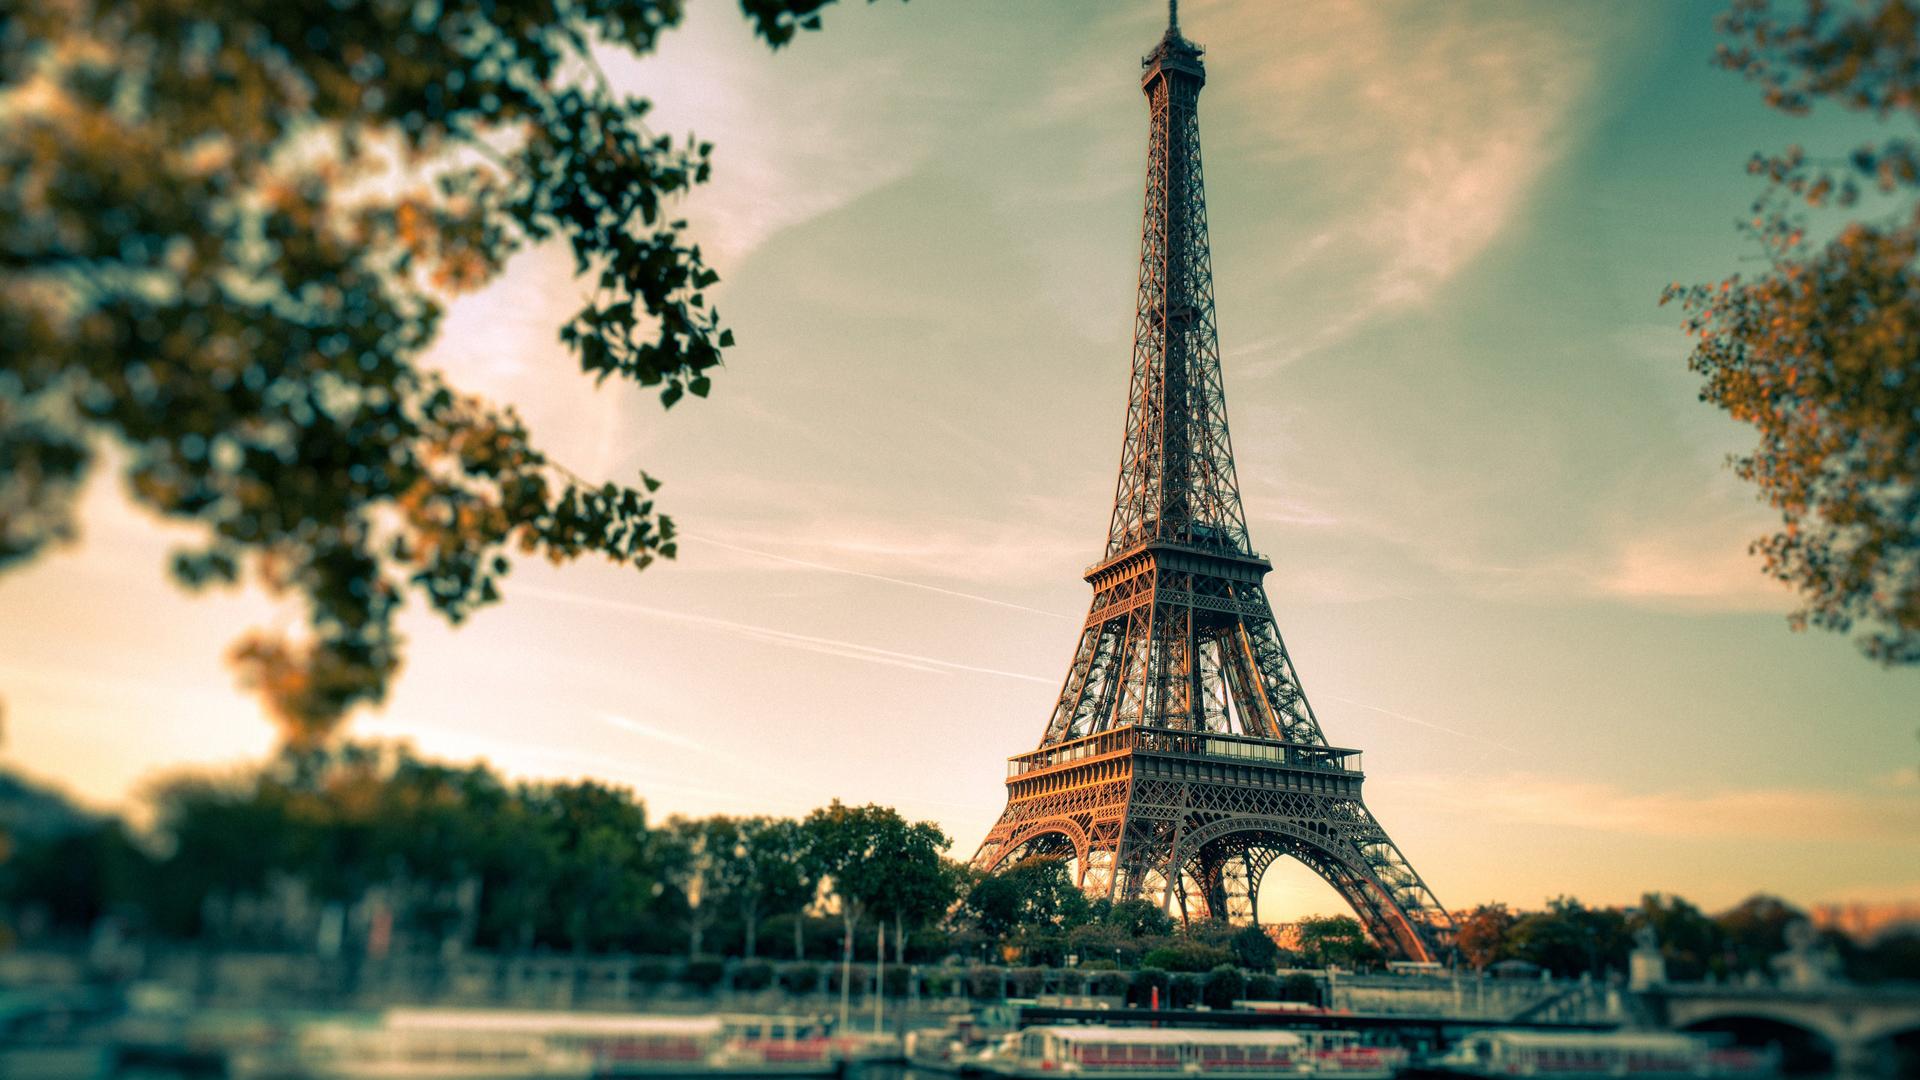 download best Paris city 1080p wallpaper download 1920x1080